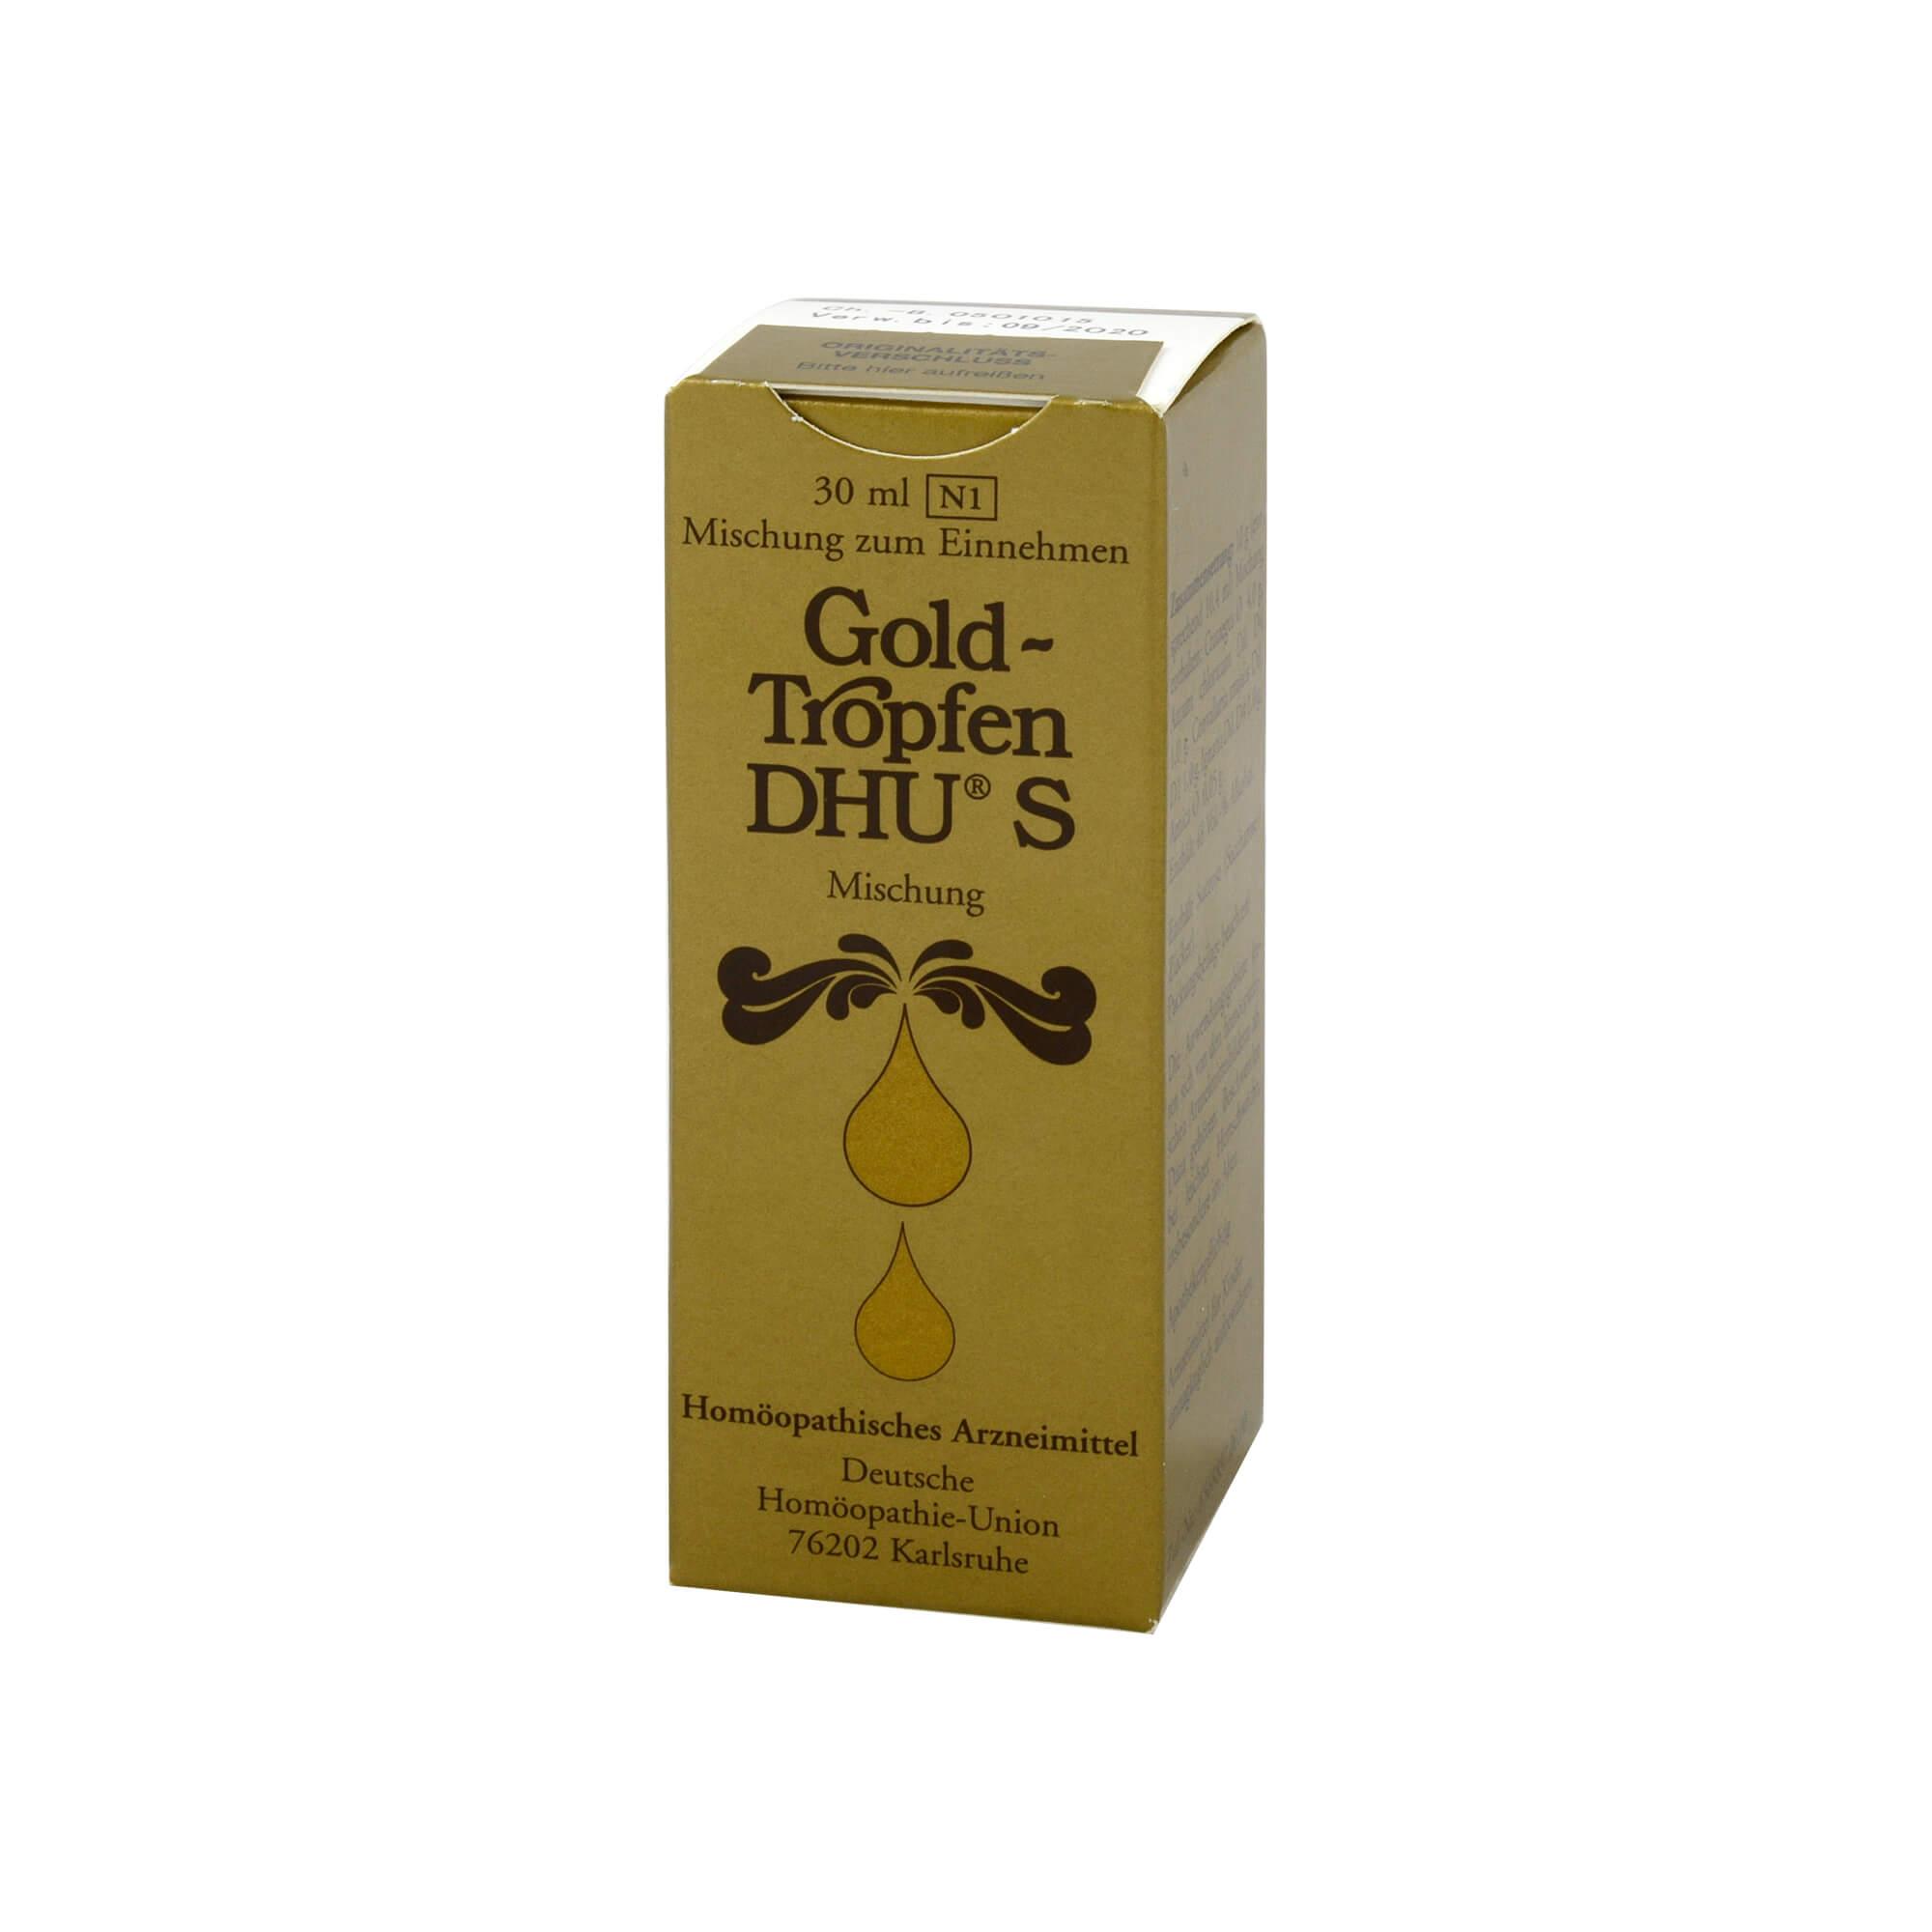 GOLDTROPFEN DHU S